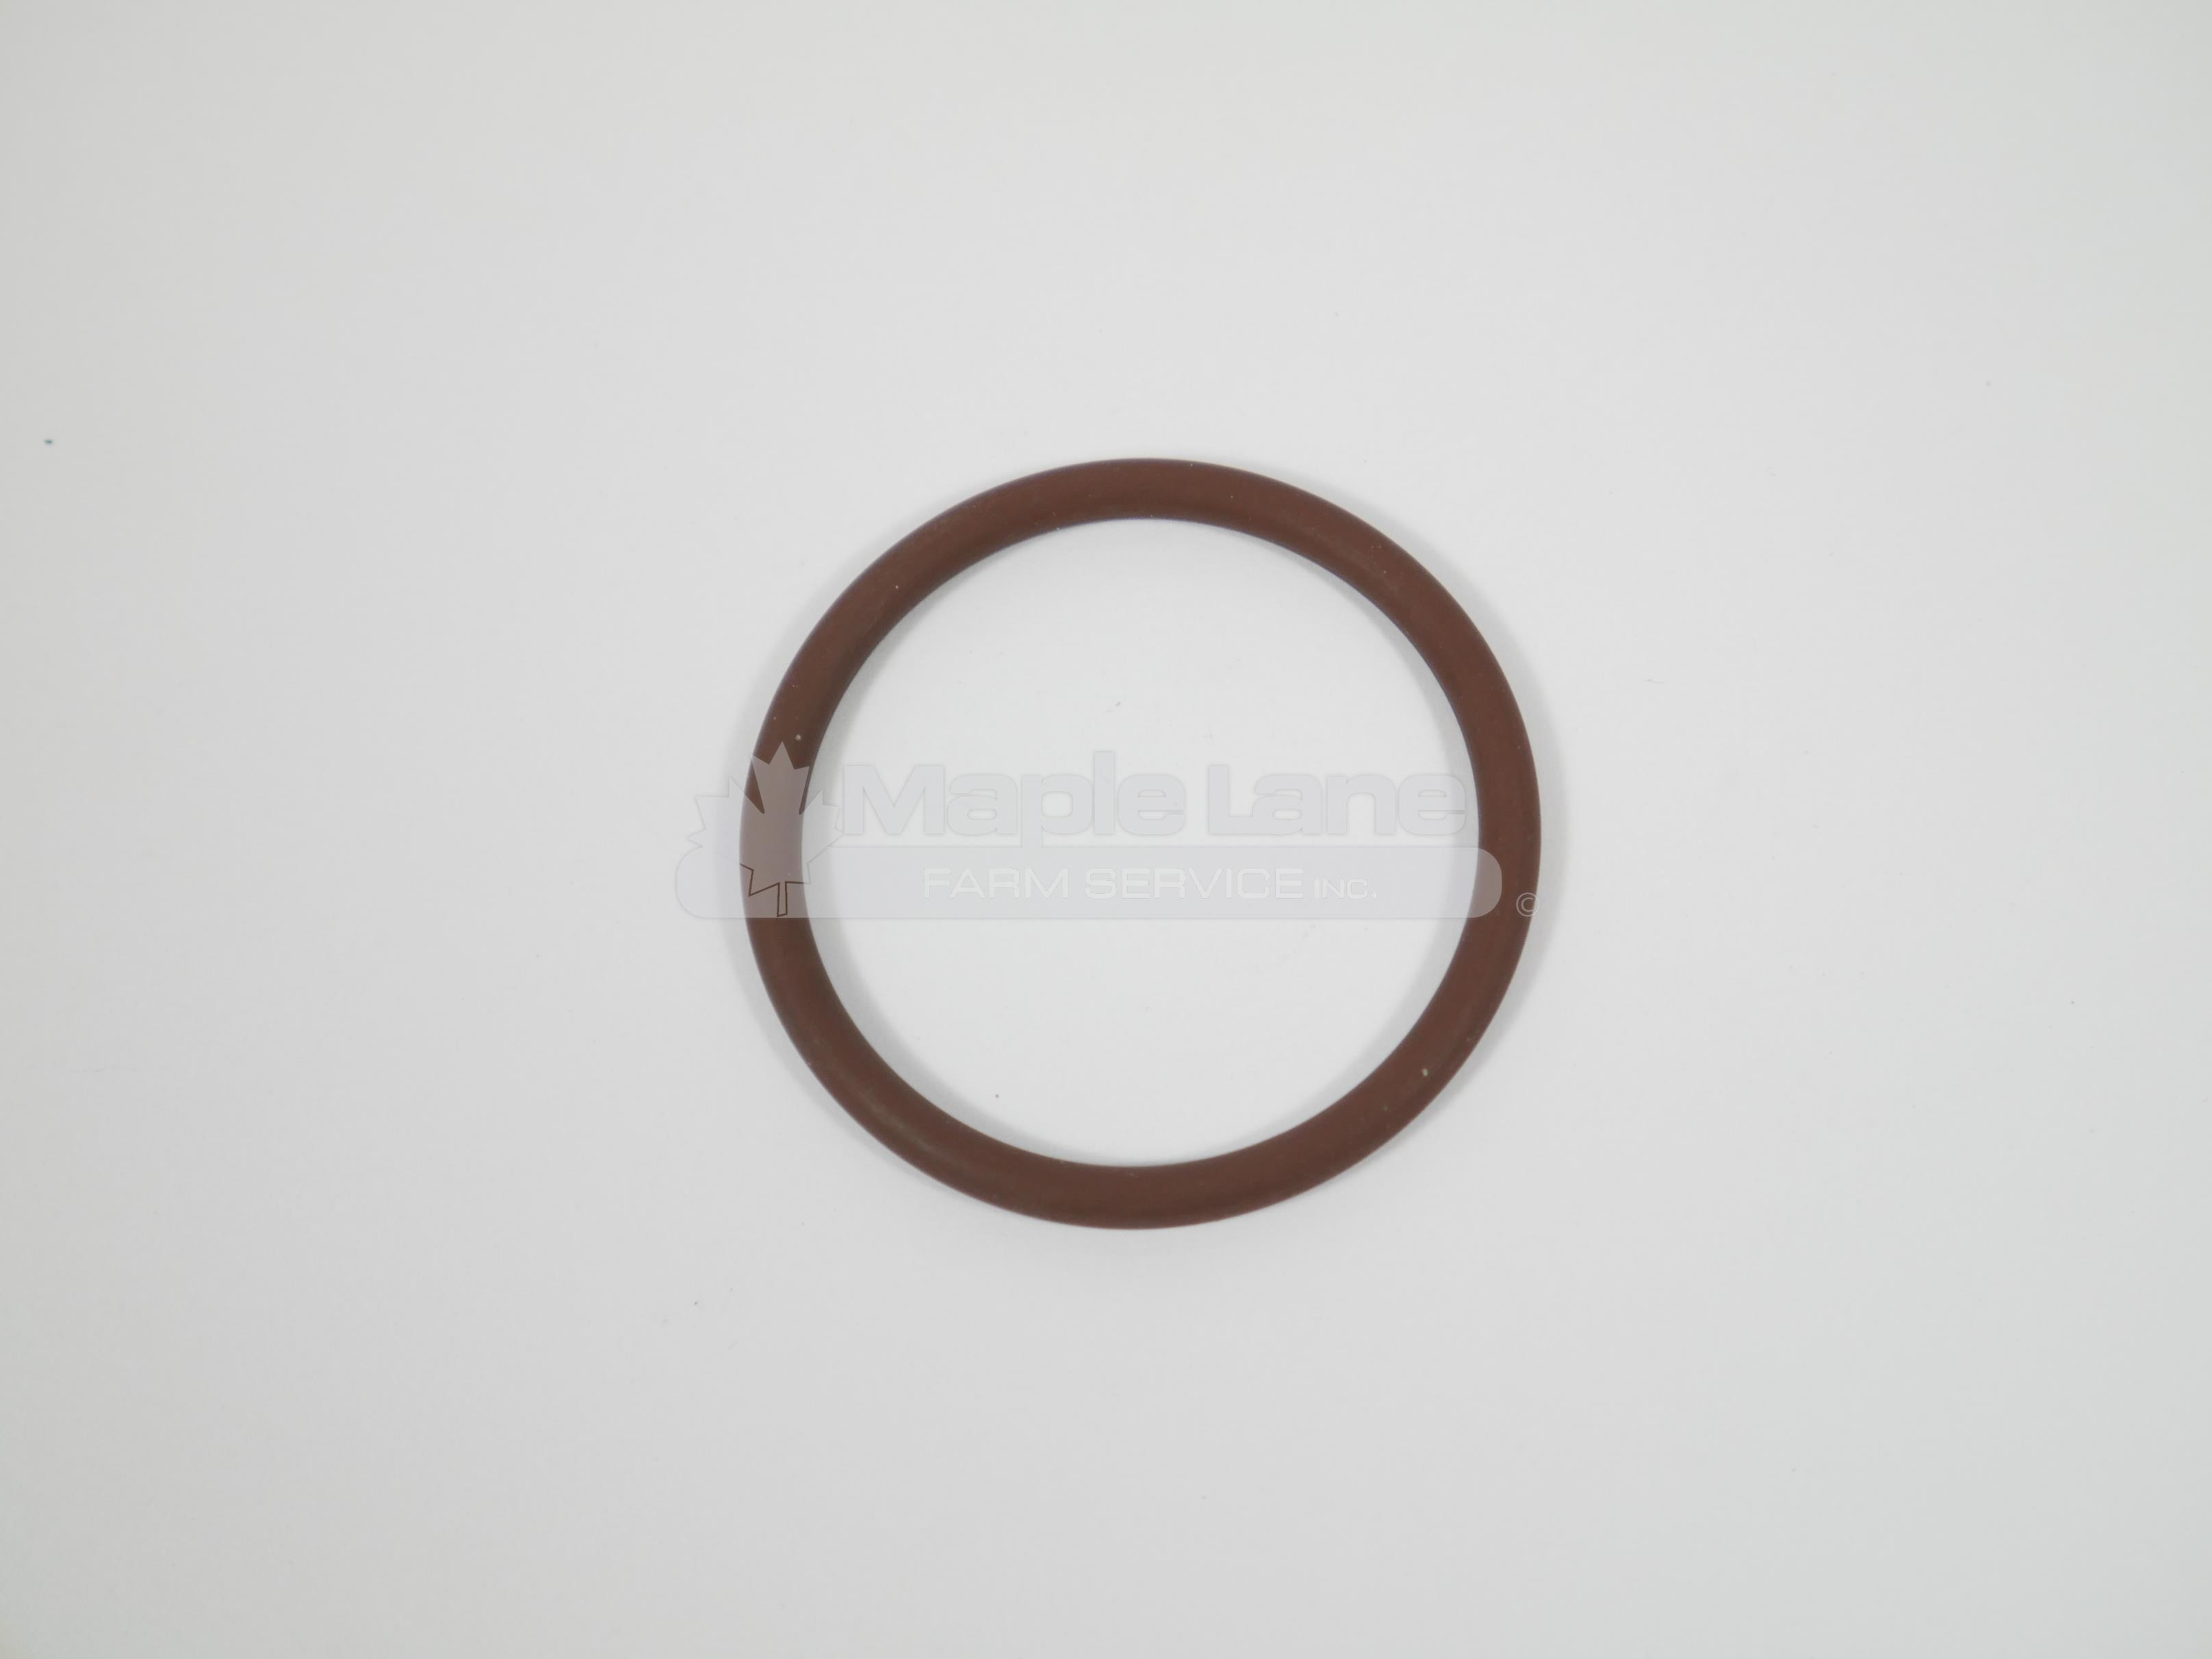 242354 O-Ring